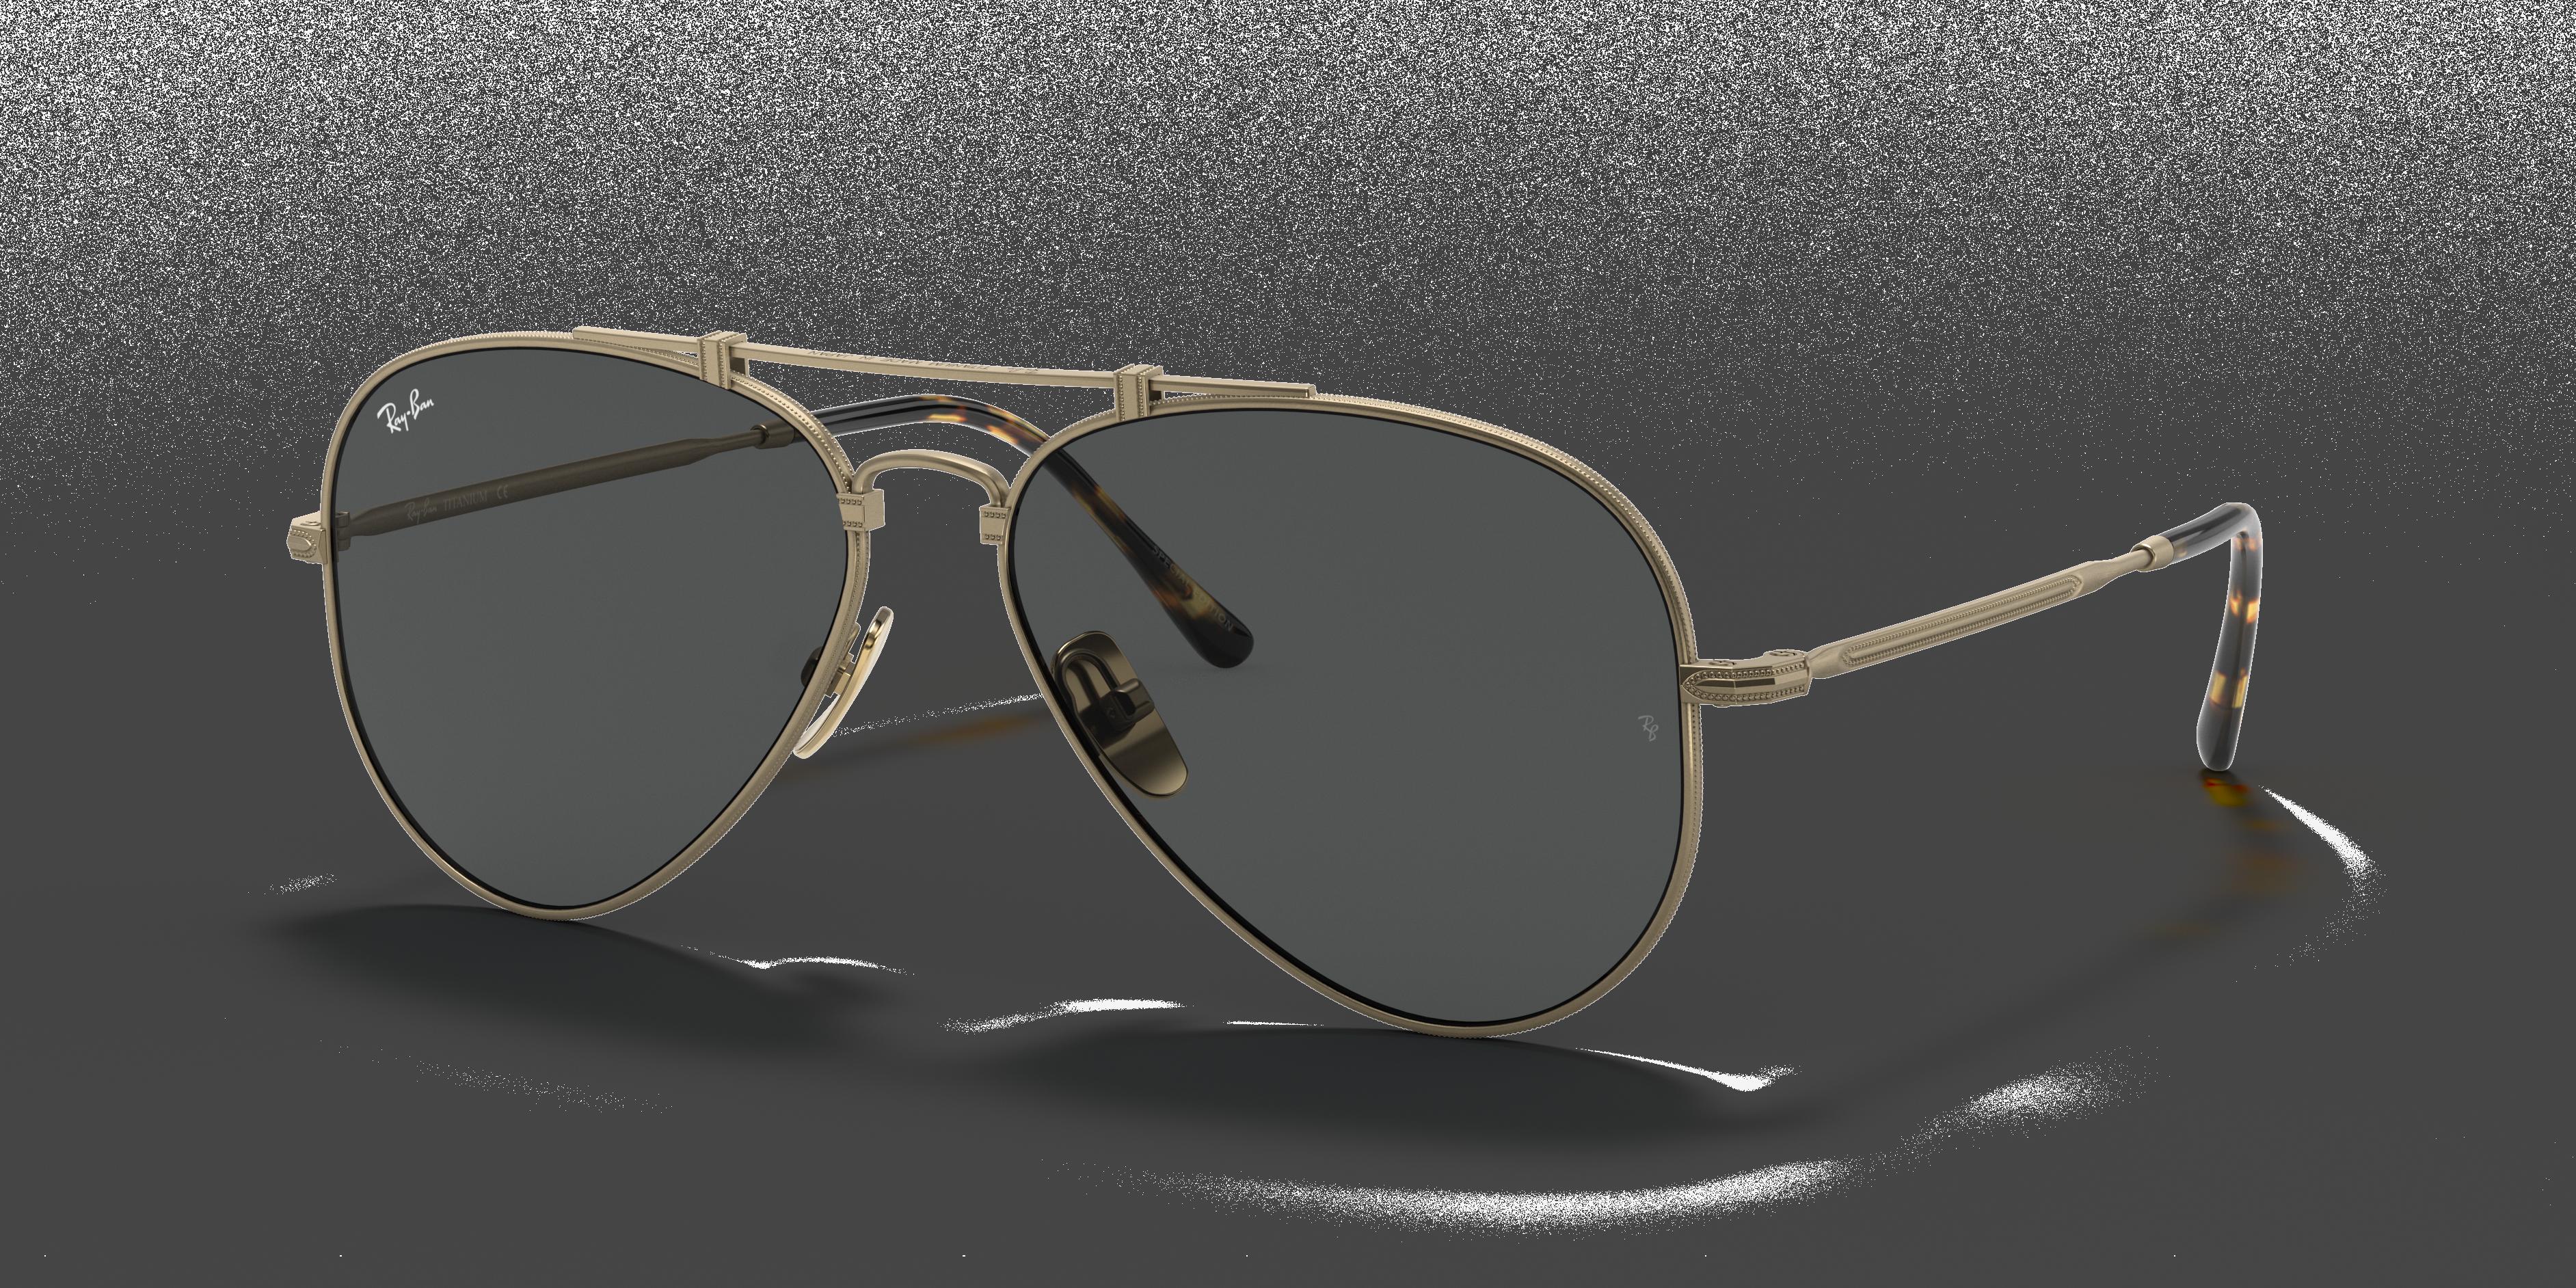 Ray-Ban Aviator Titanium Antique Gold, Gray Lenses - RB8125